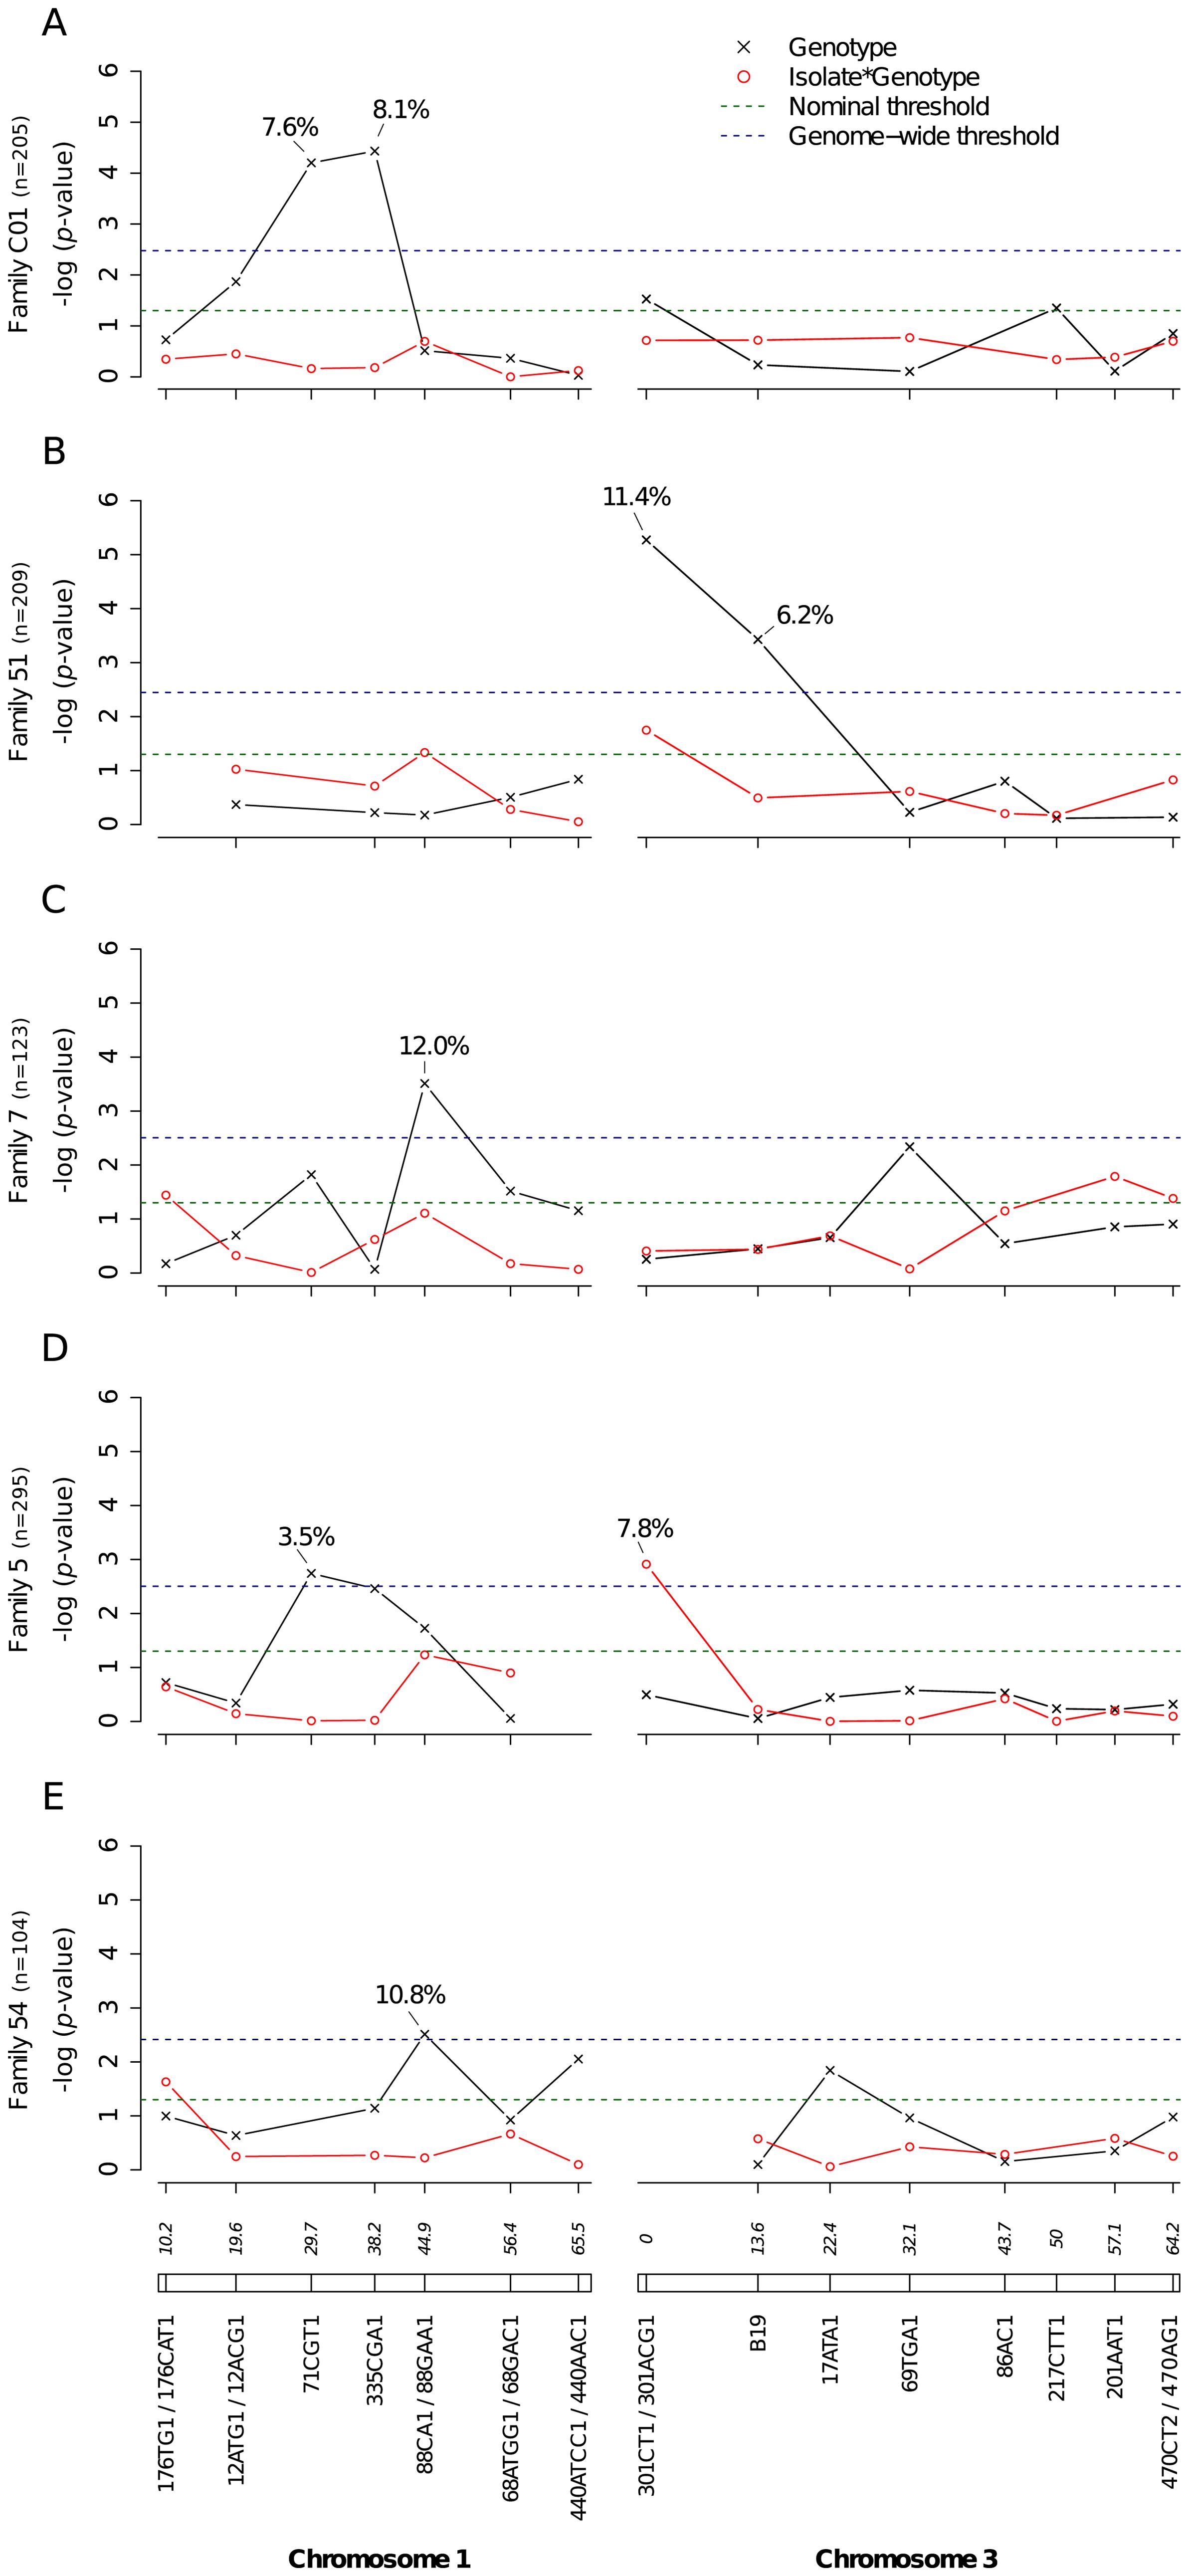 Genetic survey of <i>Ae. aegypti</i> loci associated with midgut infection.